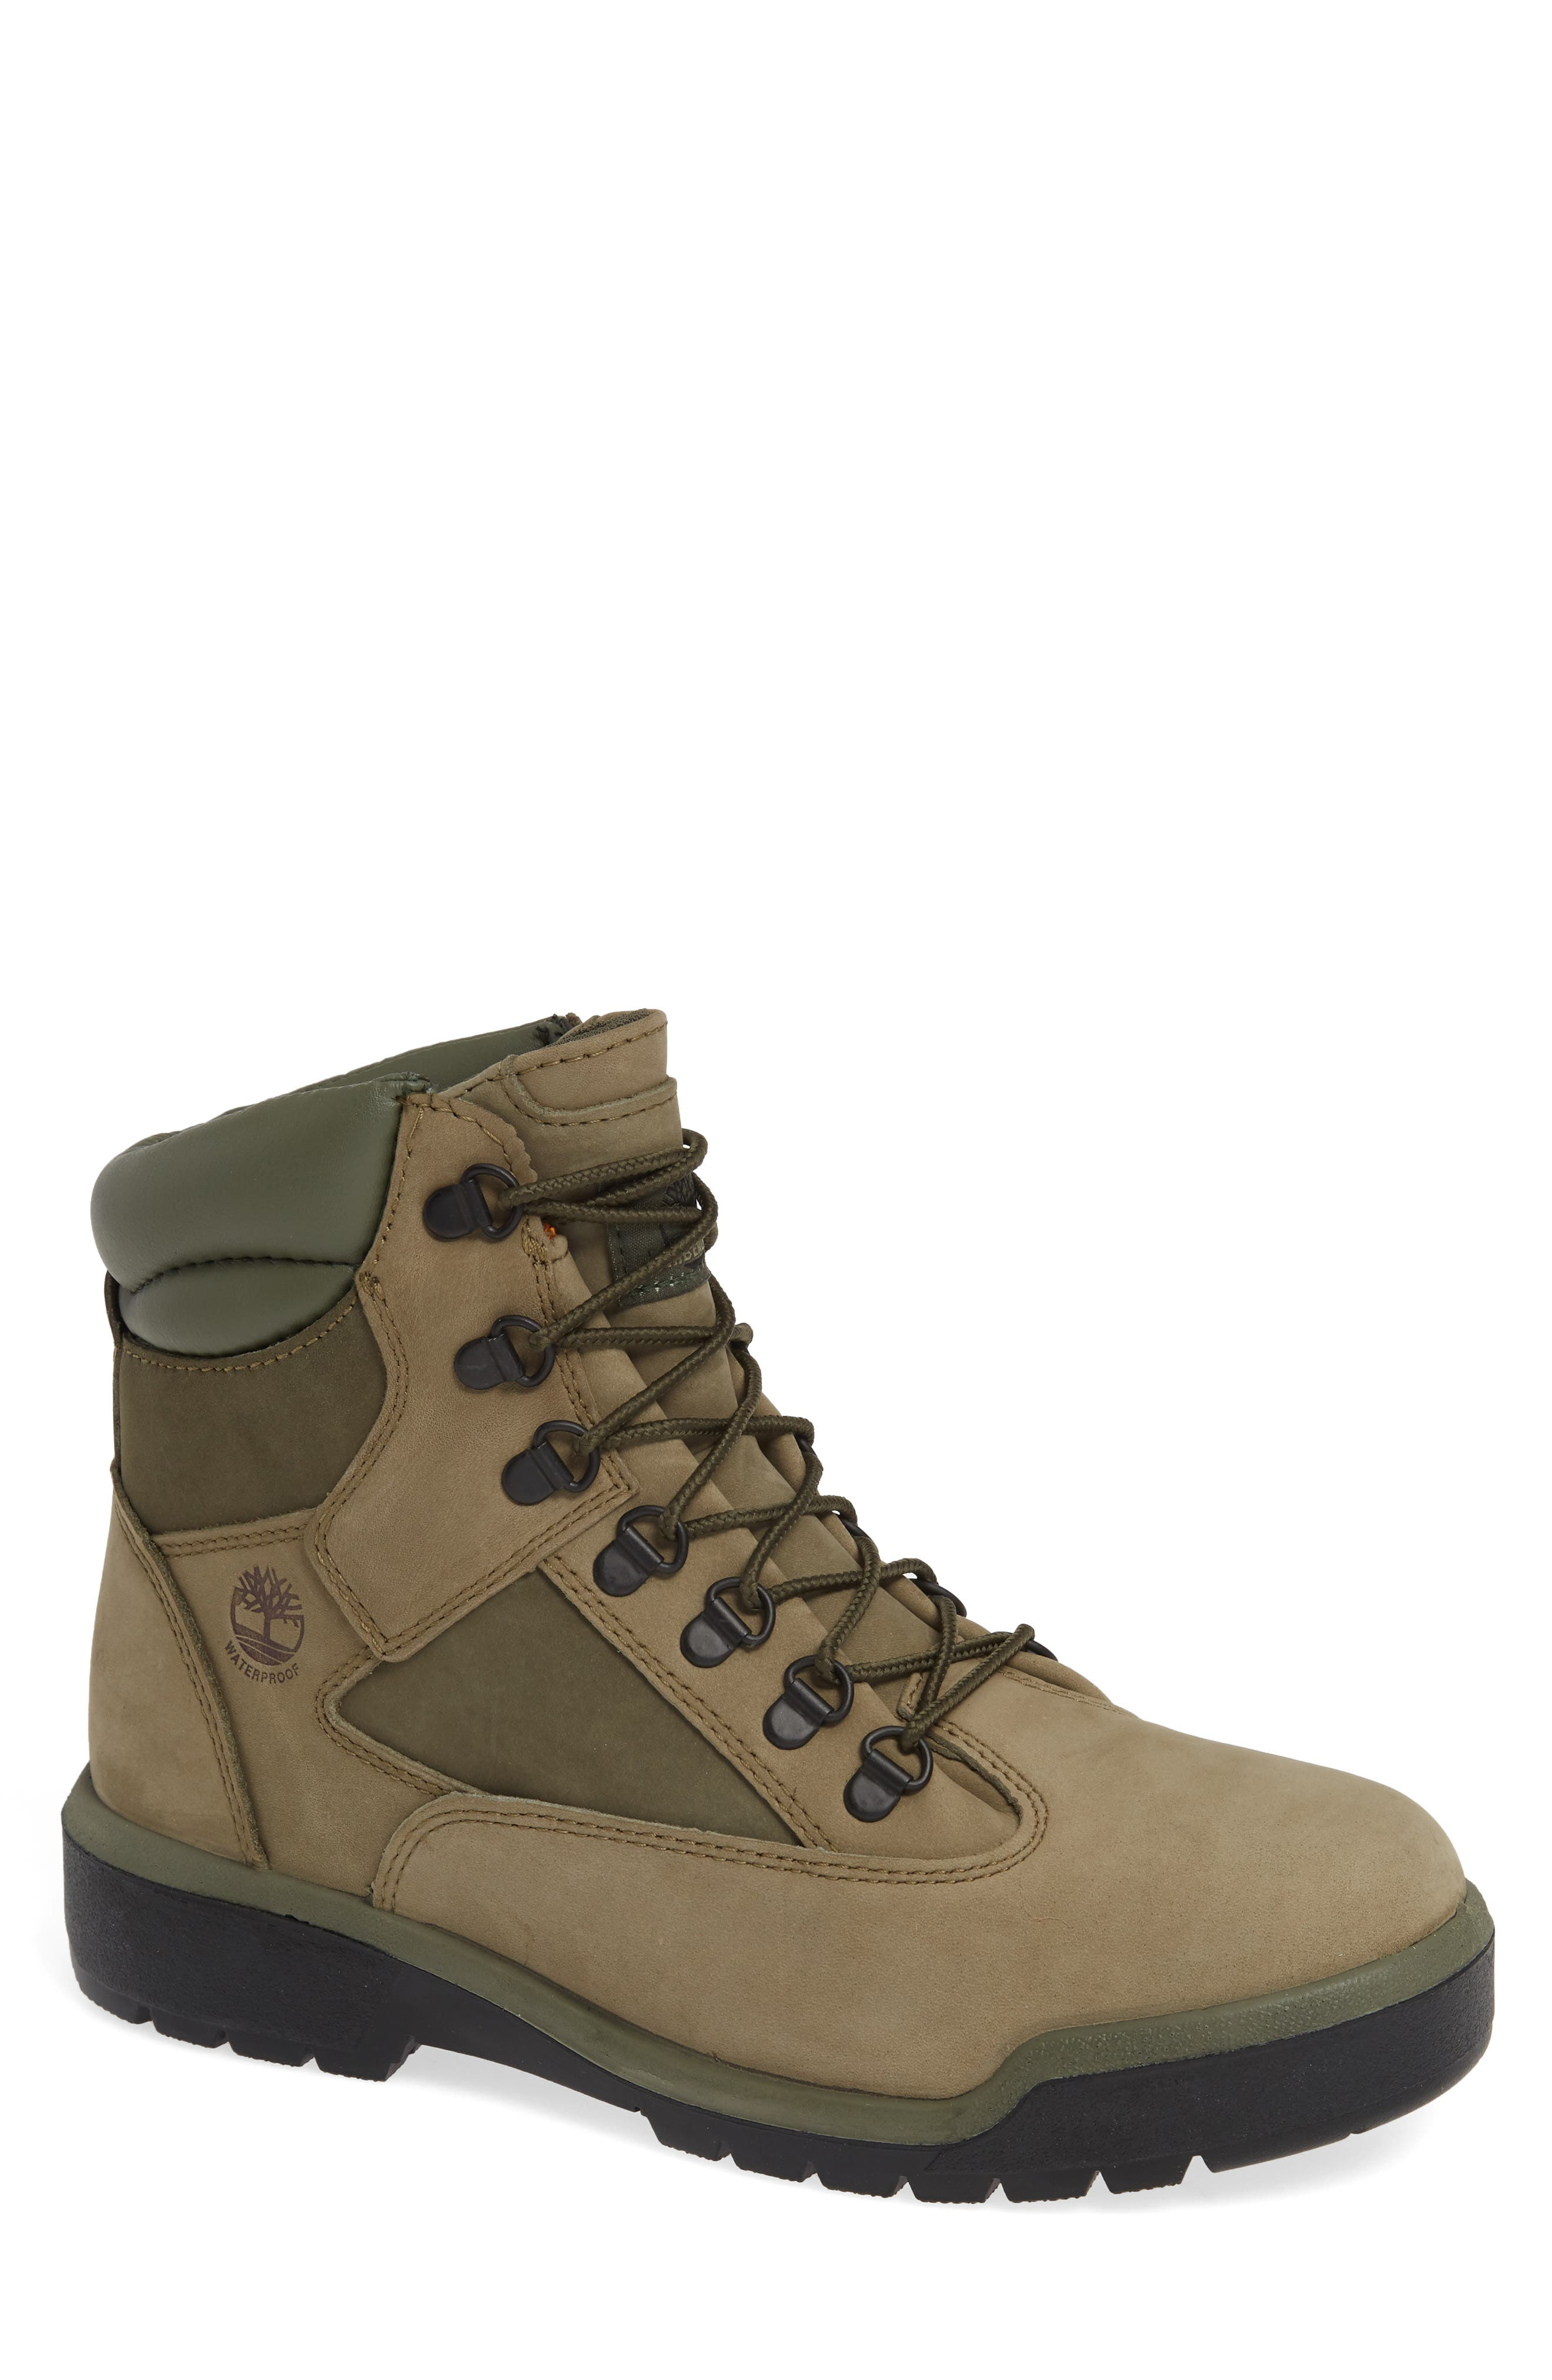 Field Waterproof Boot,                             Main thumbnail 1, color,                             280